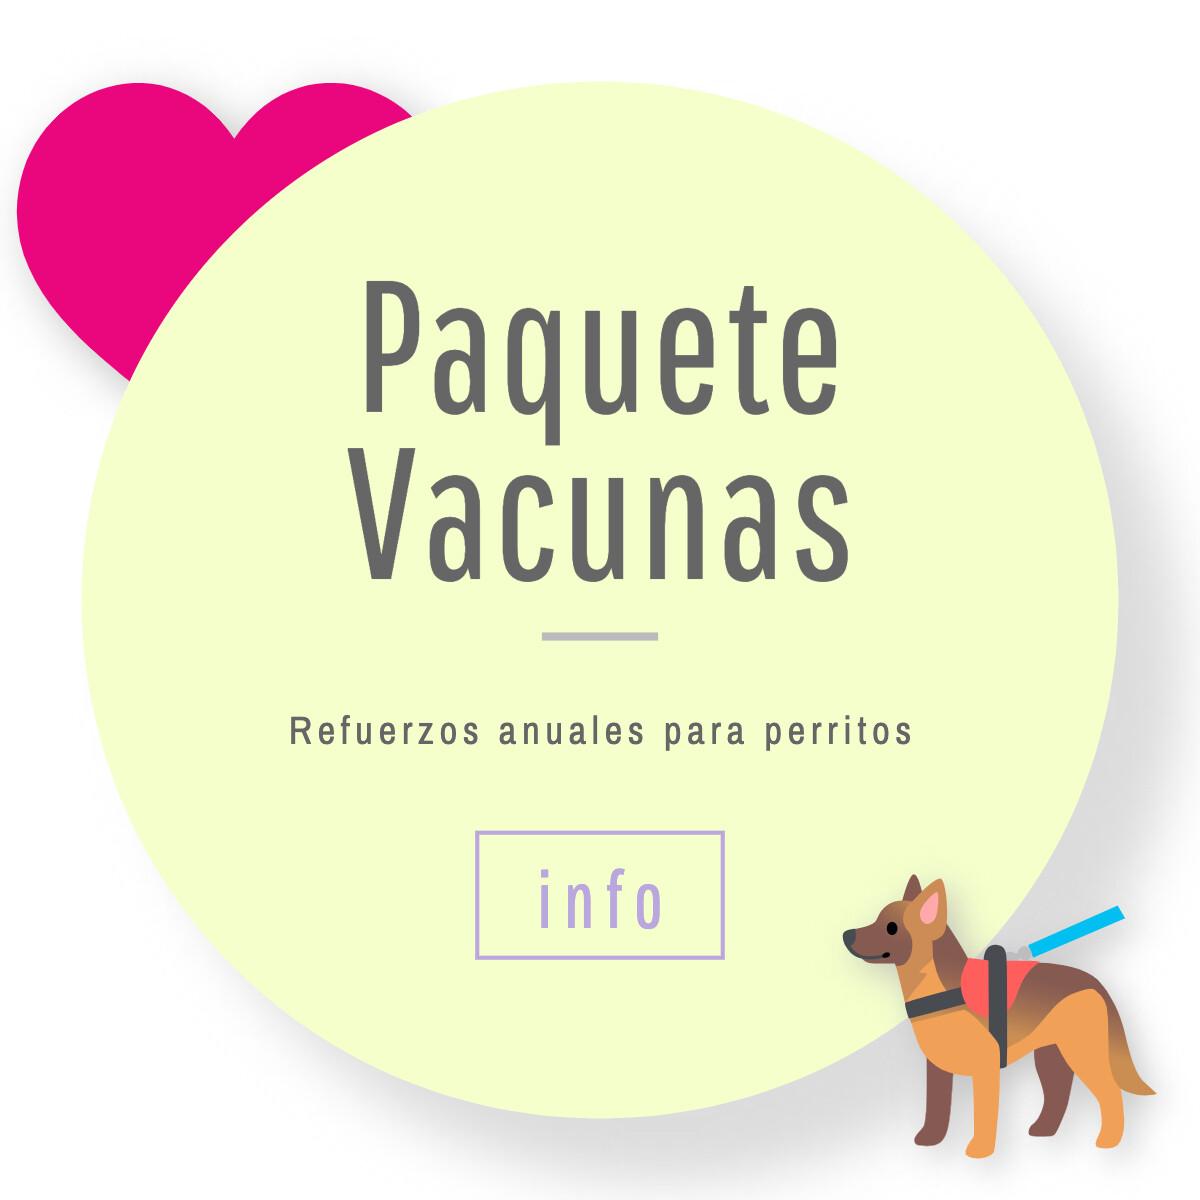 Vacunas Anuales para Perritos